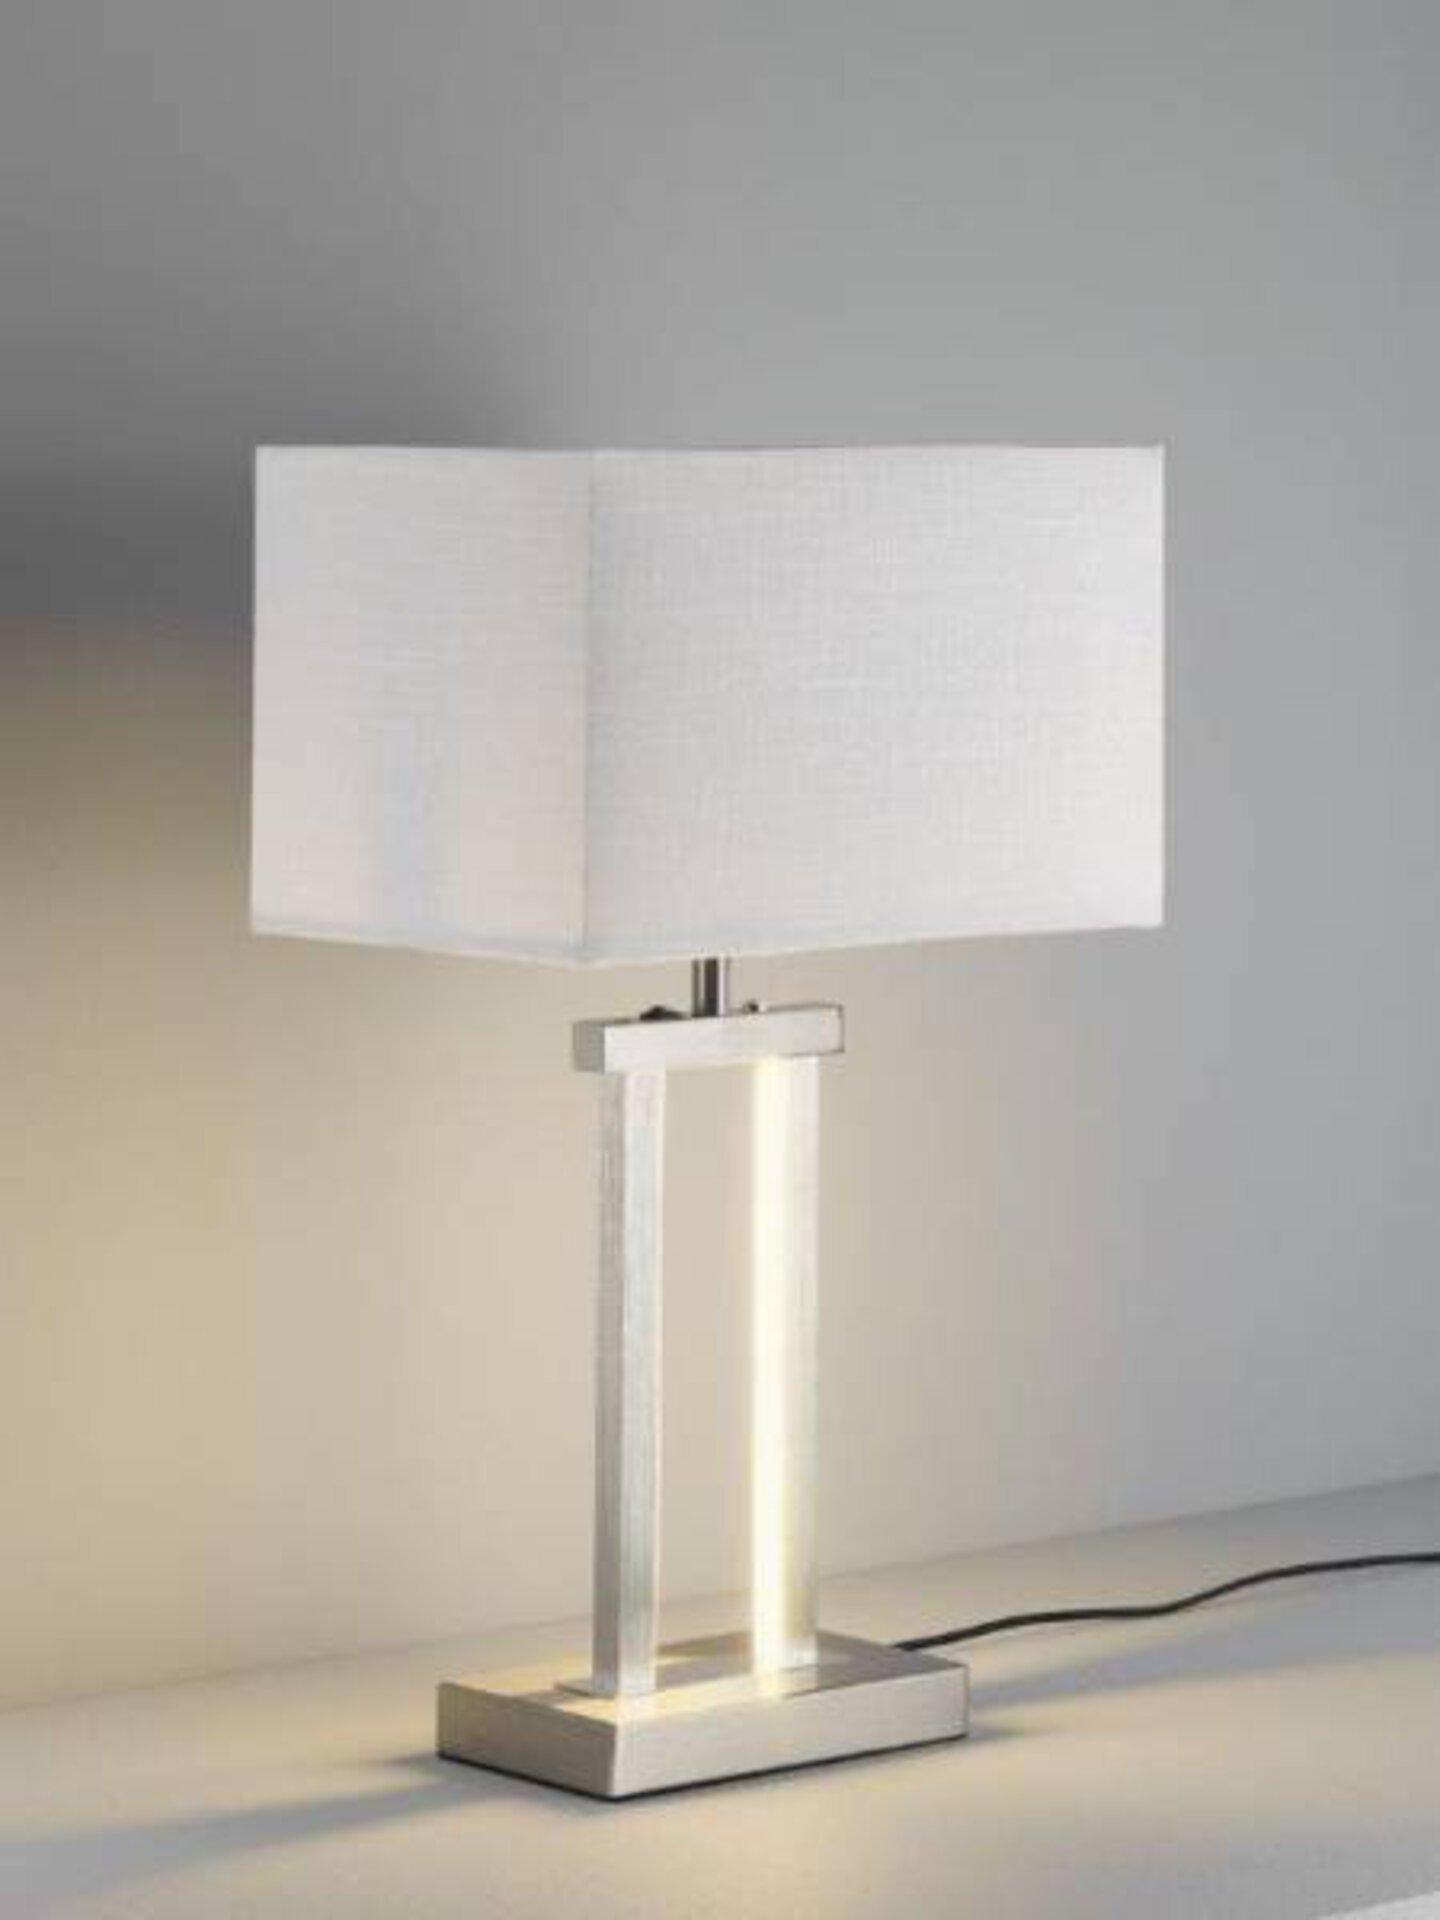 Tischleuchte Domo MONDO Metall silber 32 x 55 x 20 cm